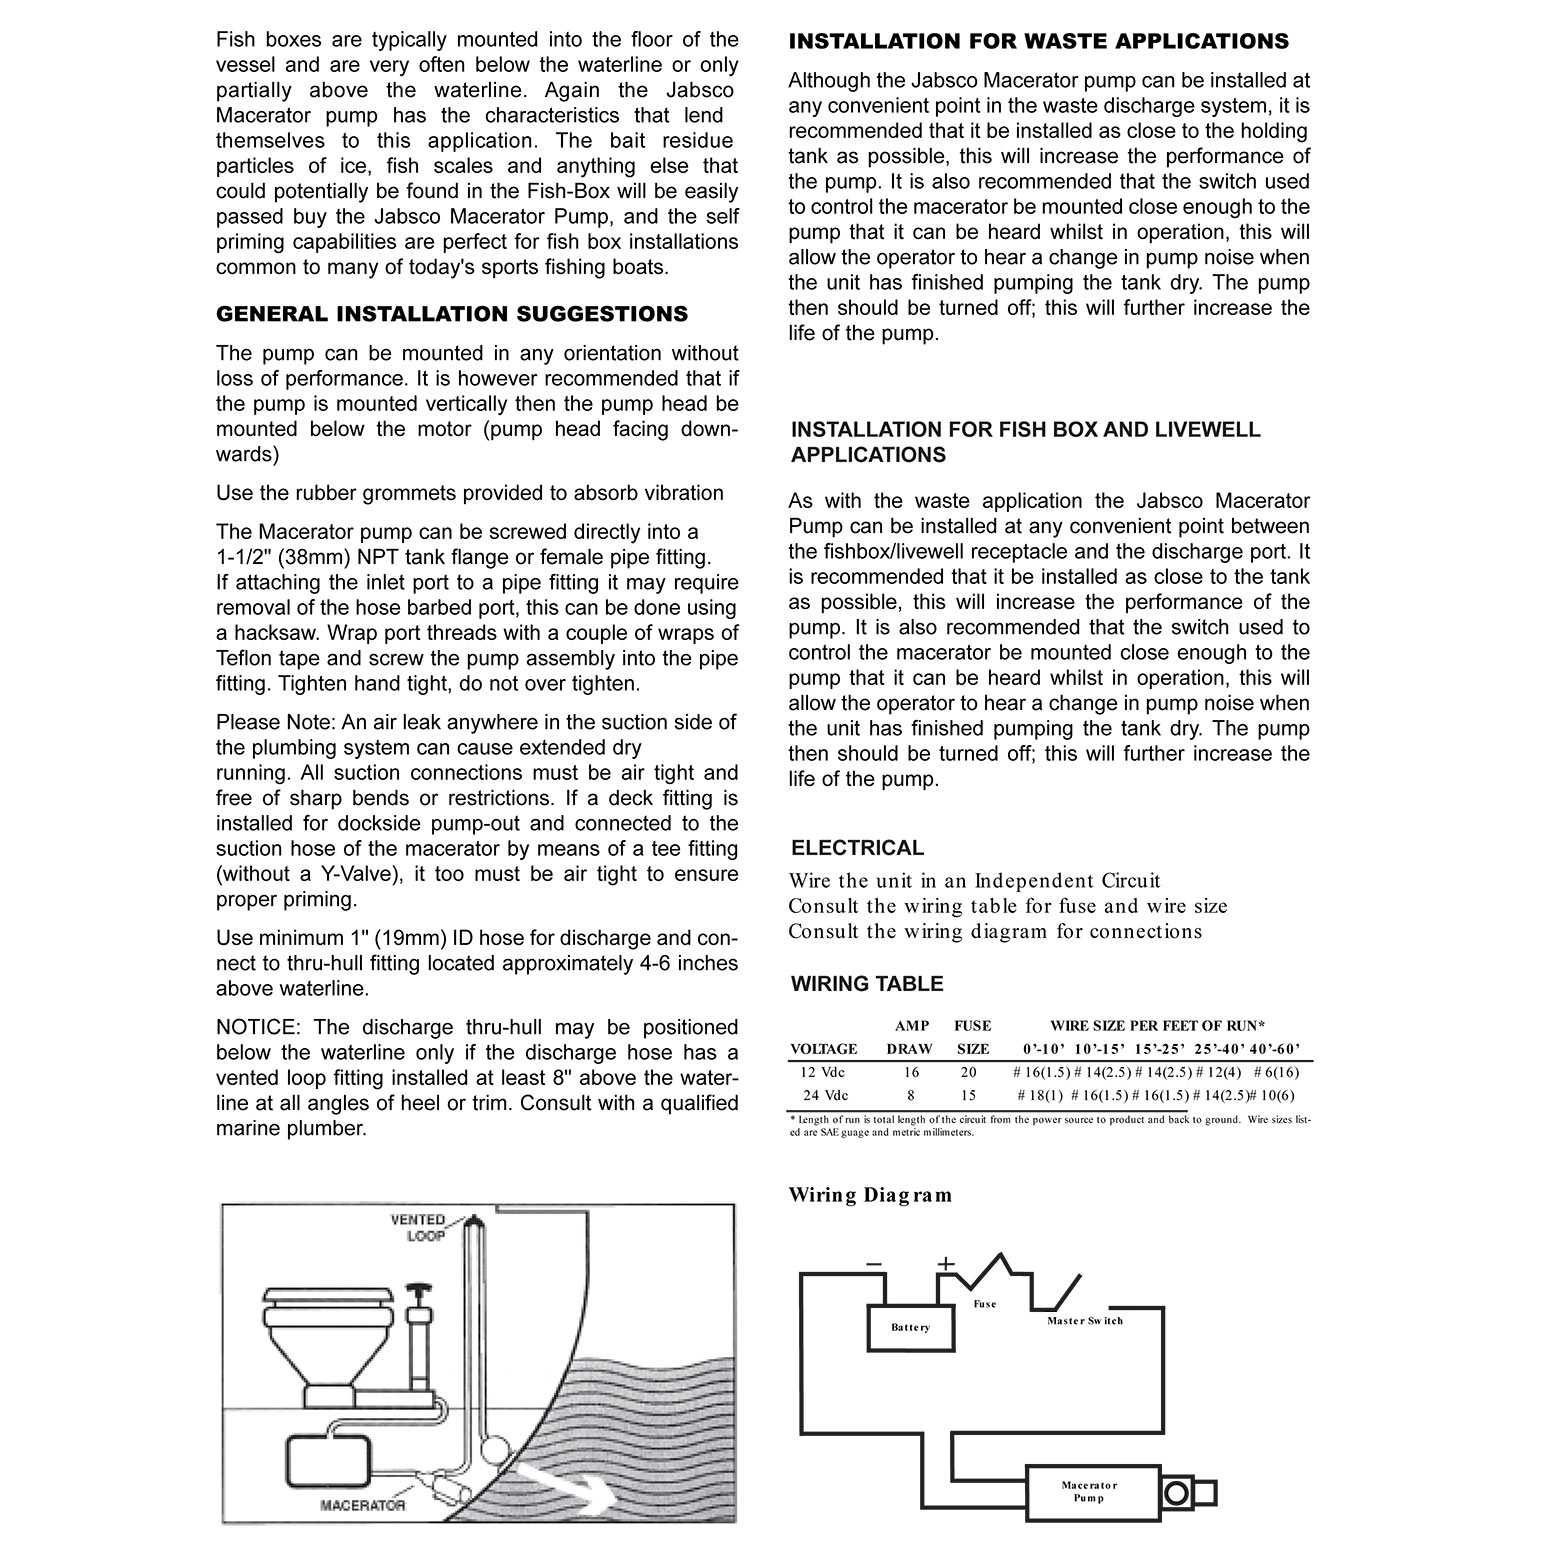 th_4300] jabsco macerator pump wiring diagram free diagram  capem gious xero xolia mohammedshrine librar wiring 101